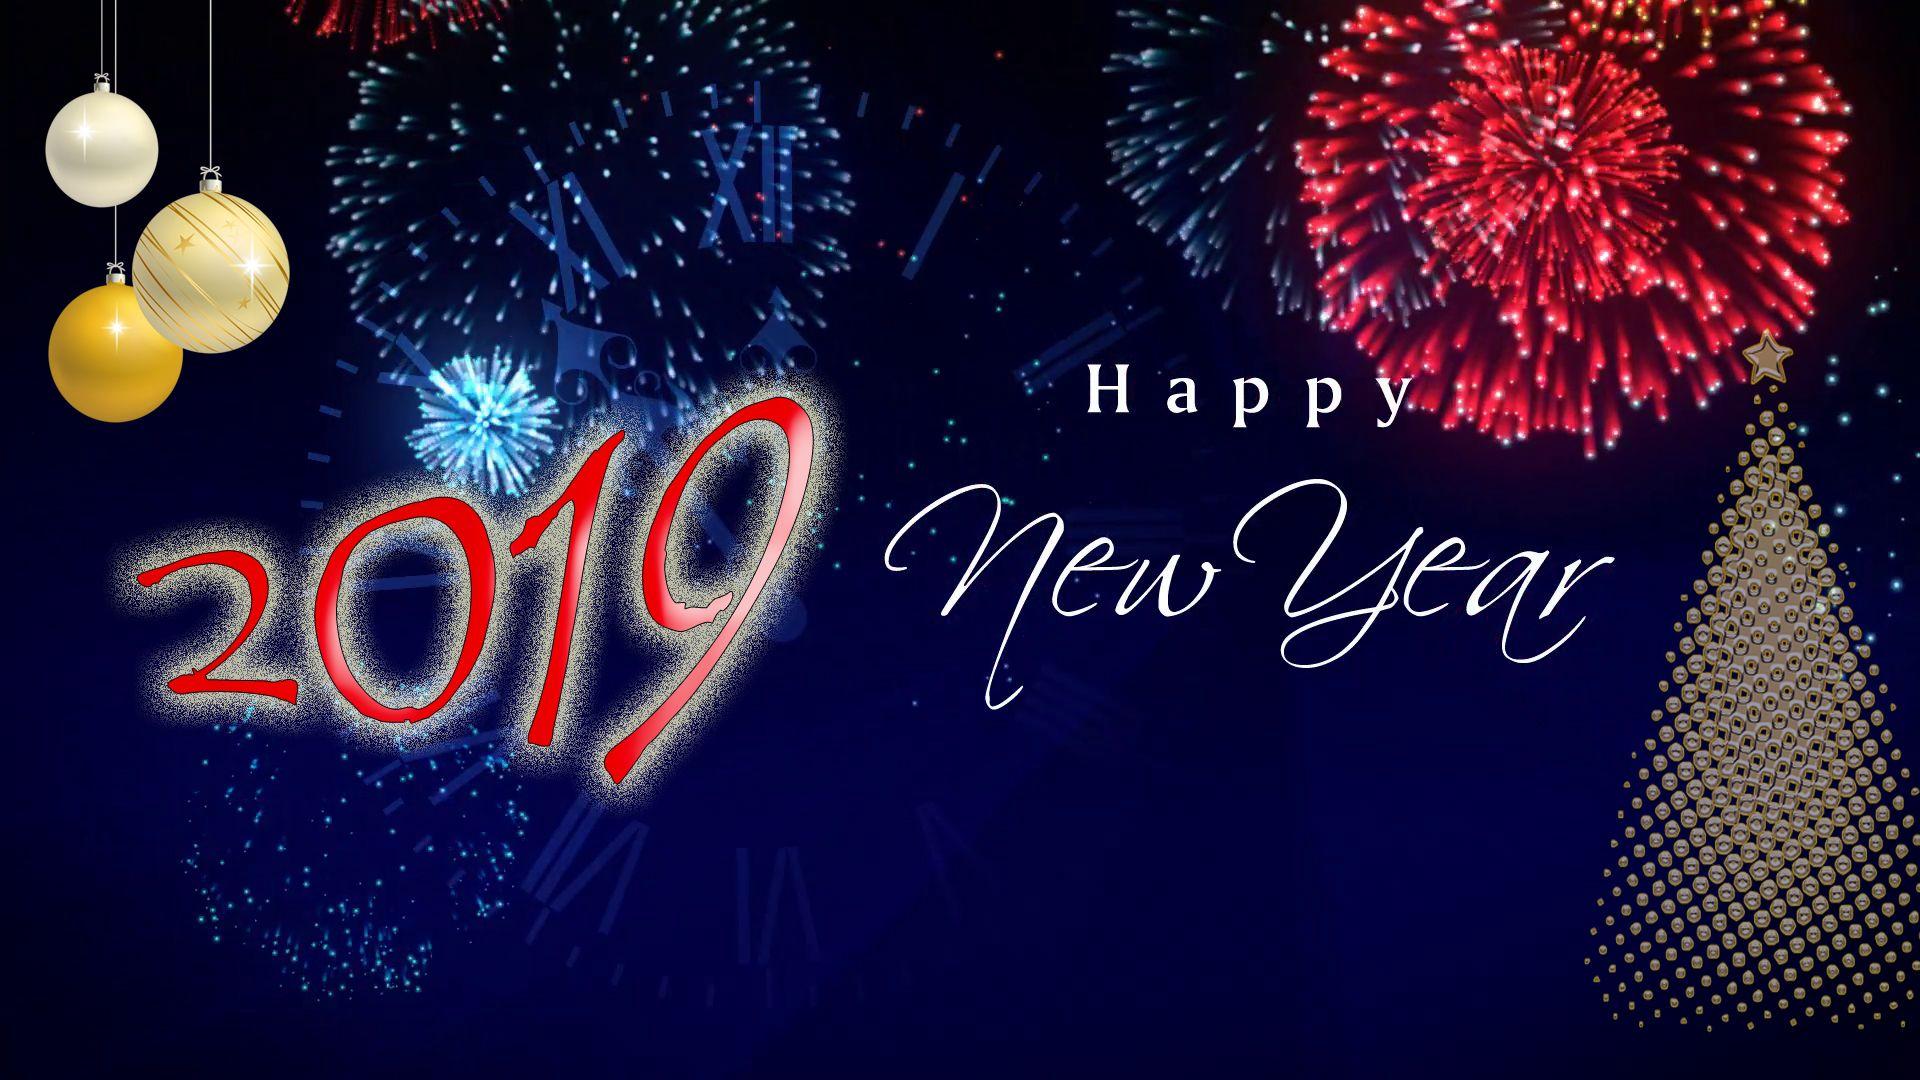 Beautiful Happy New Year 2019 Wallpapers for Desktop